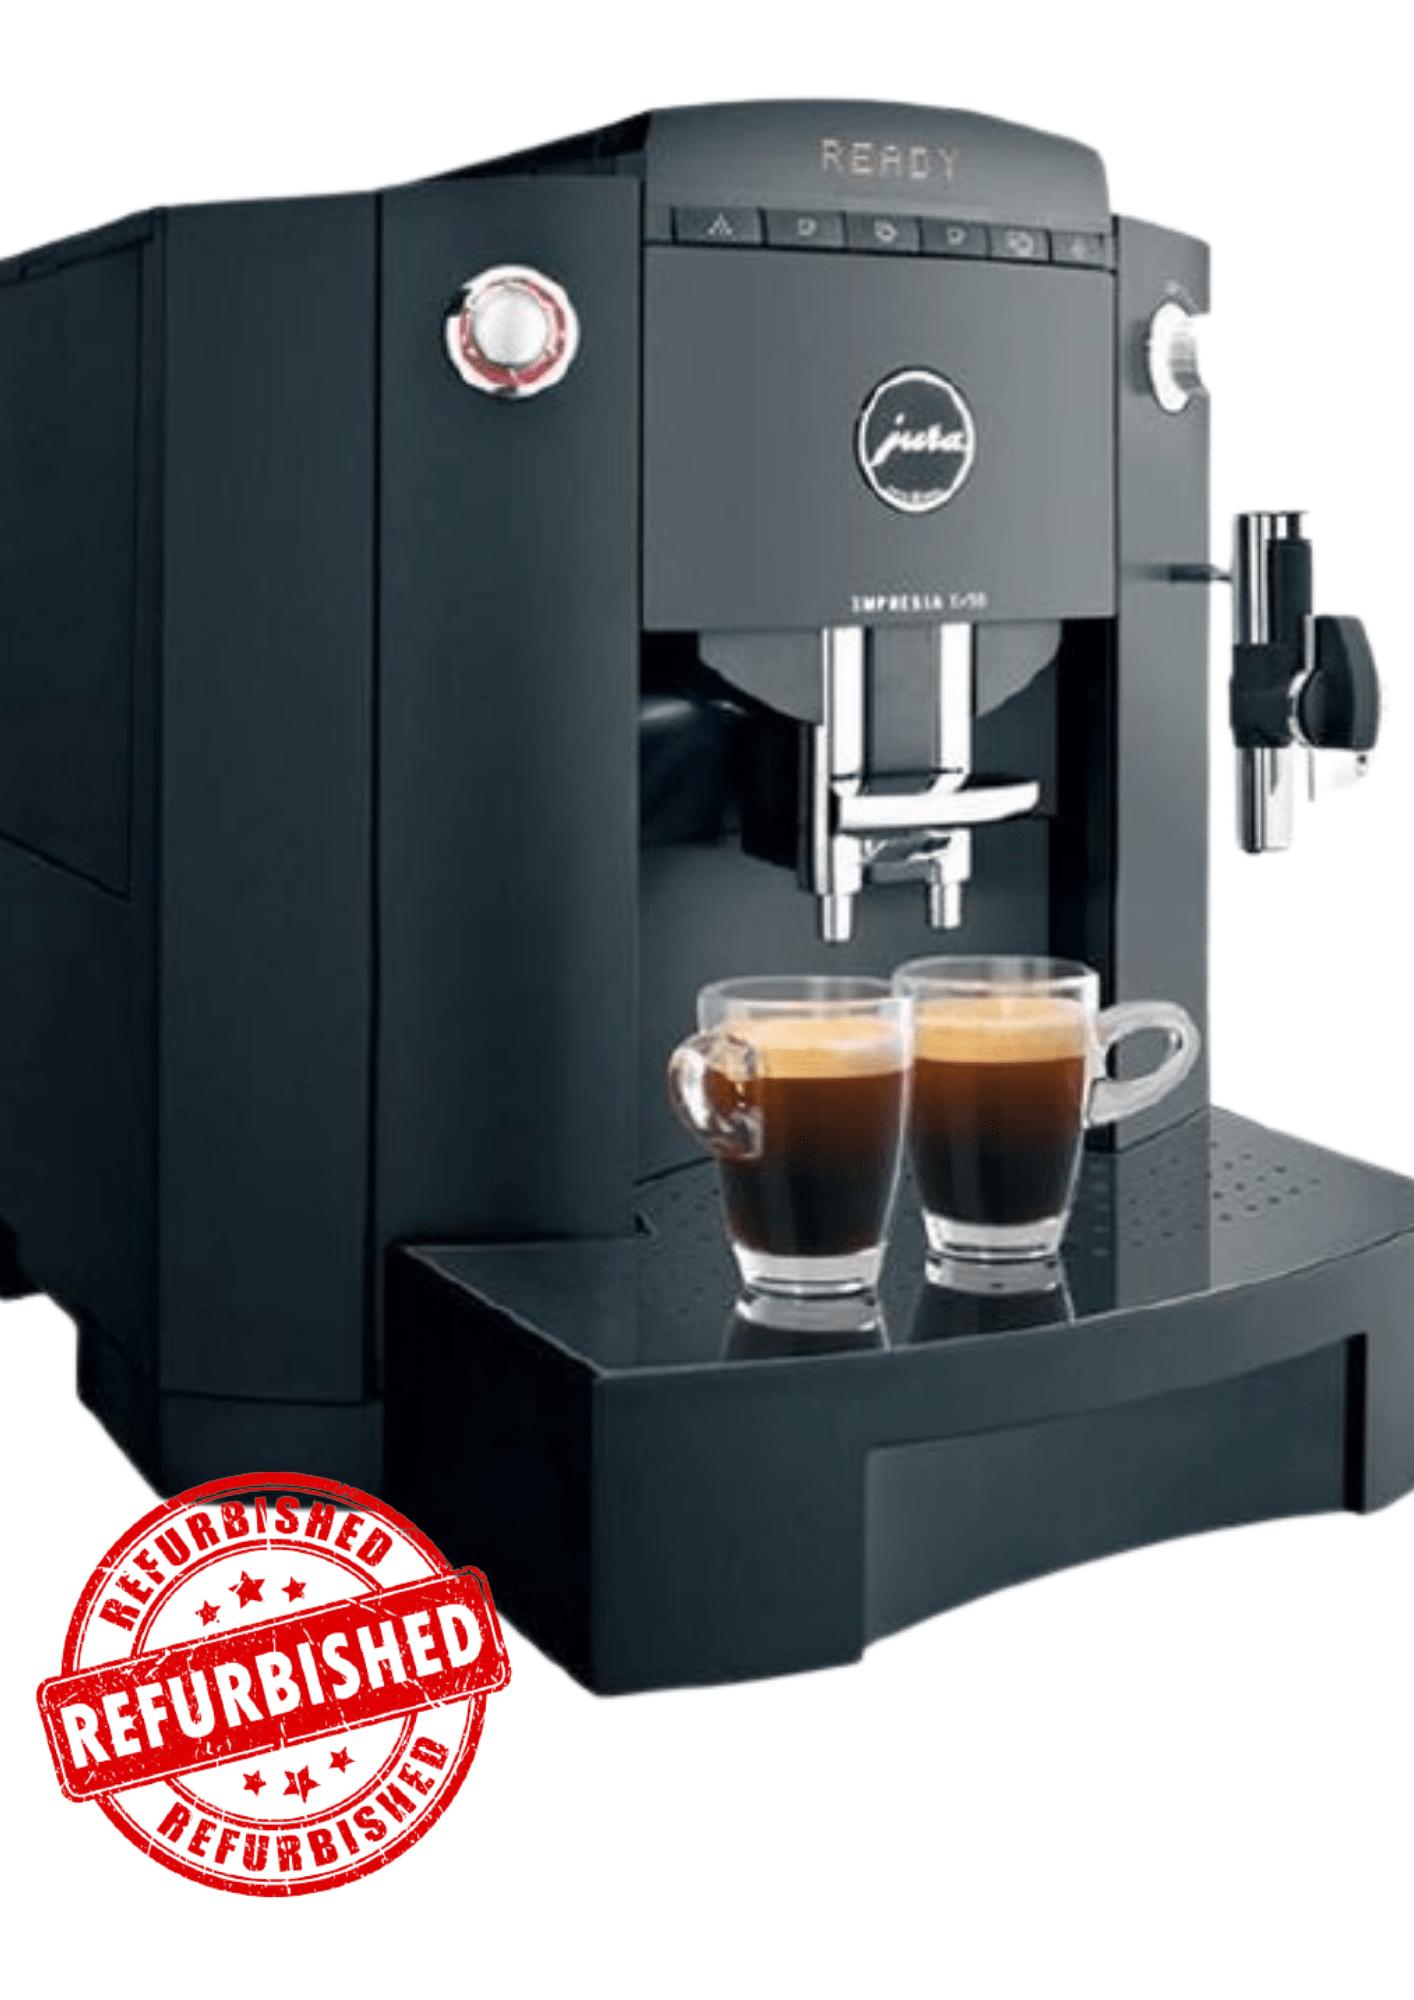 Refurbished koffiemachines